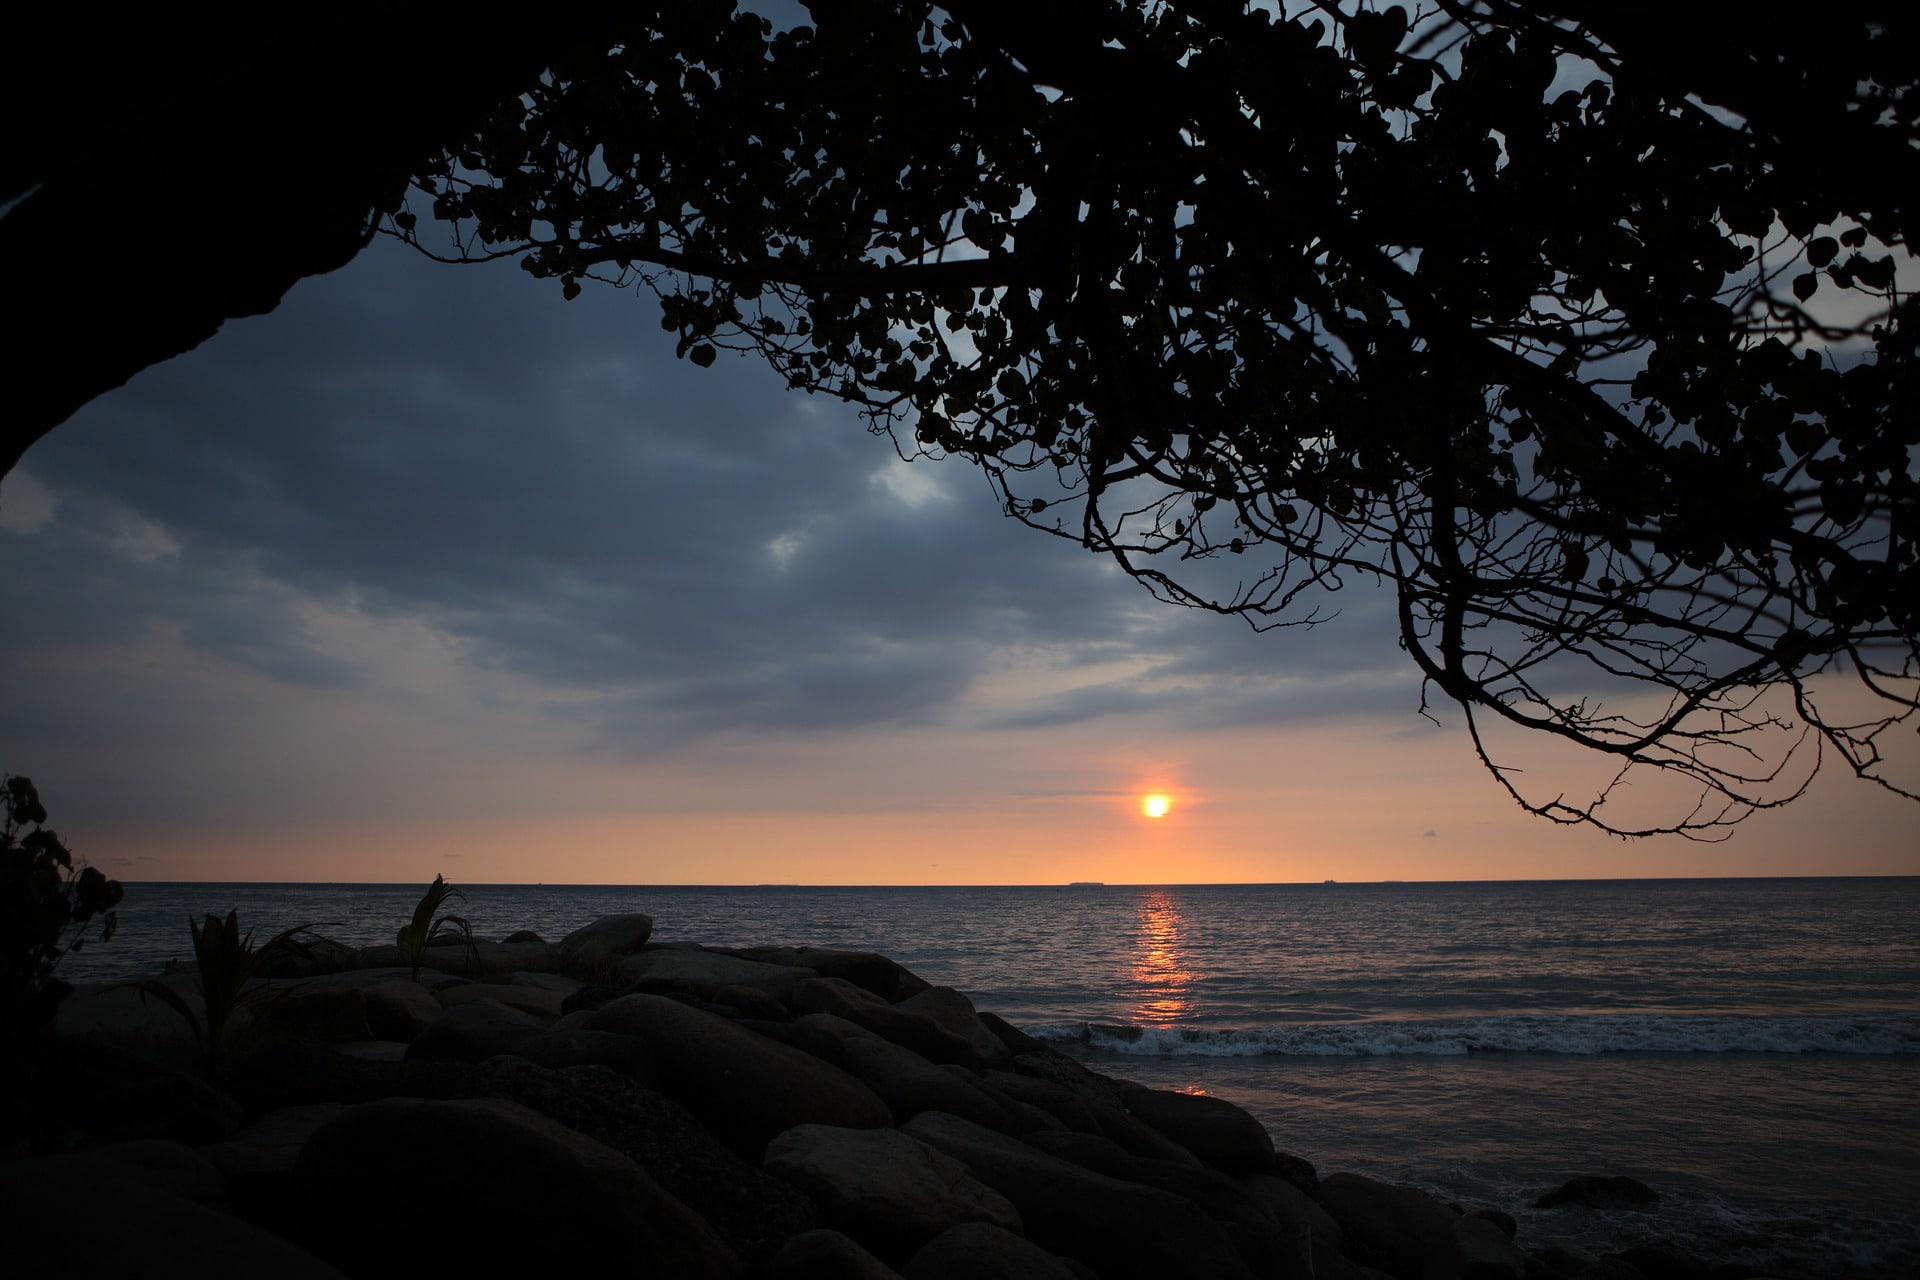 La plage de Padang